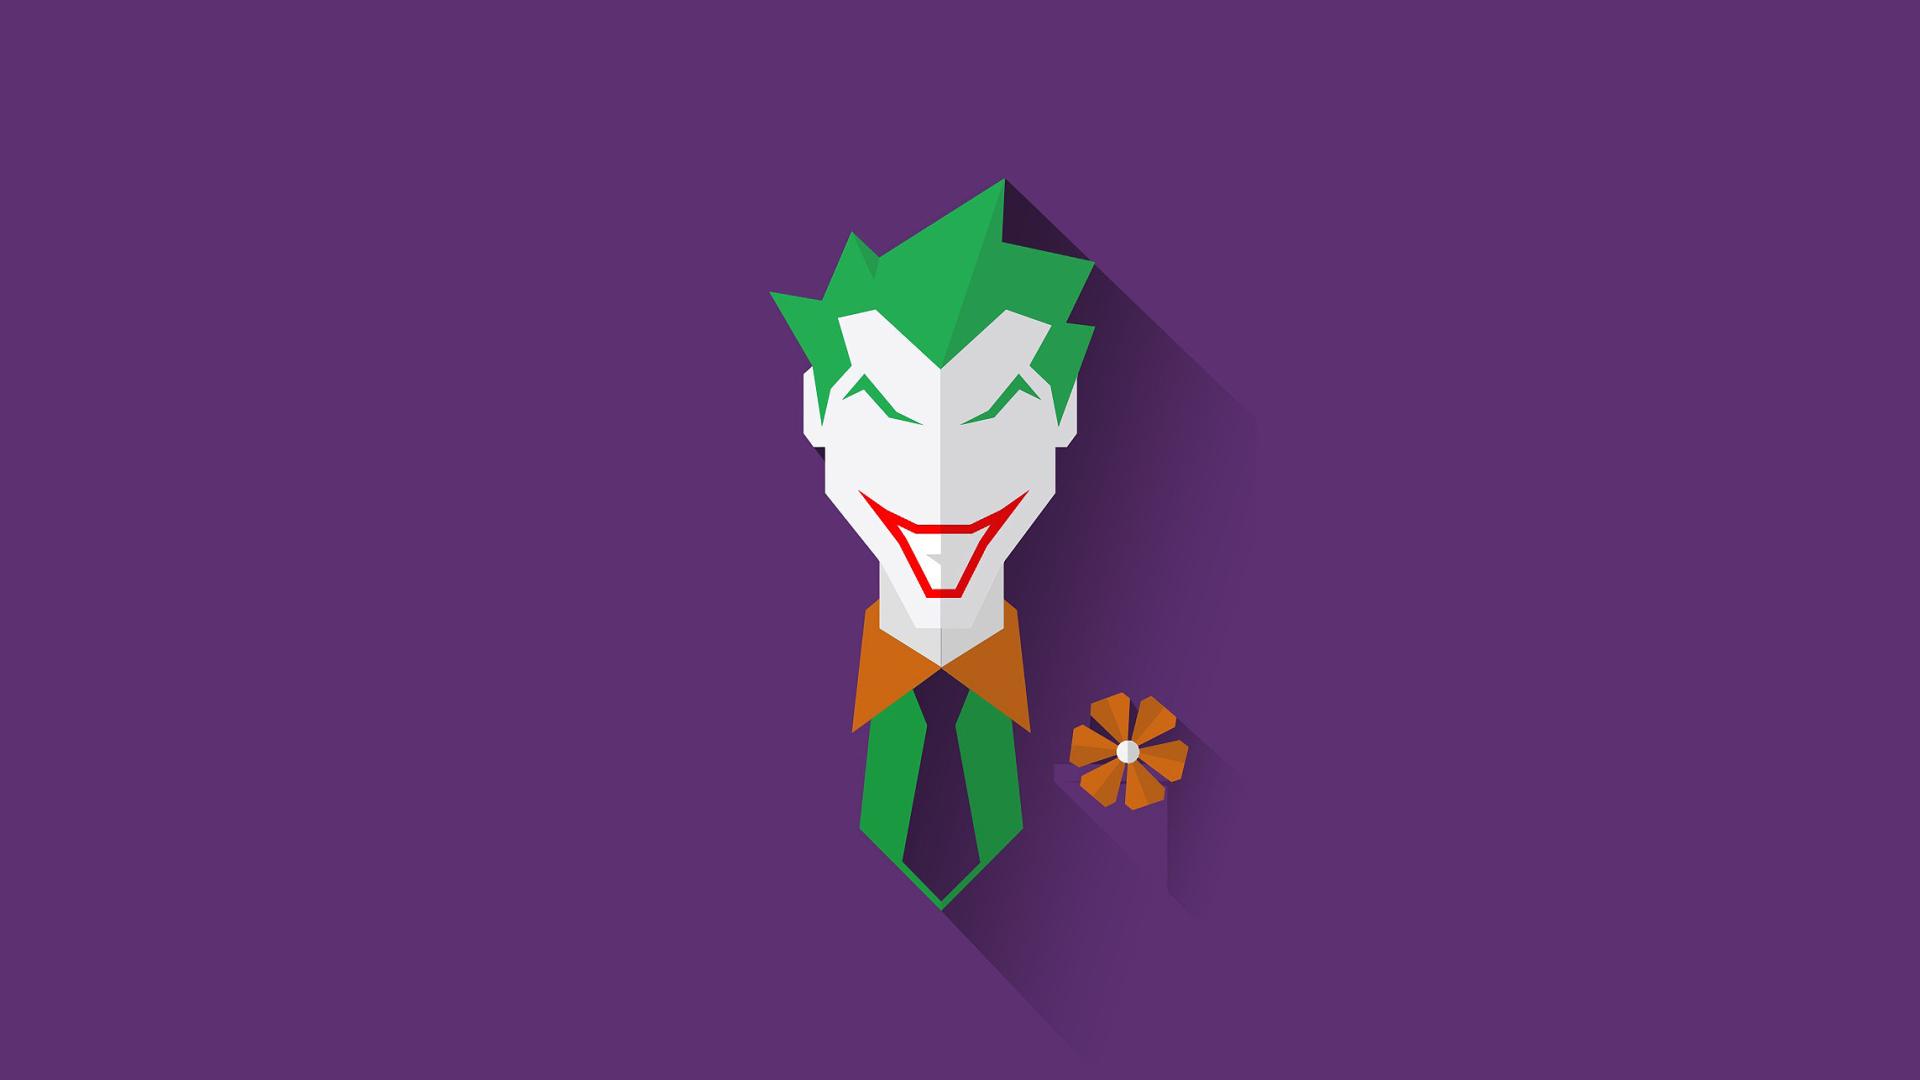 1920x1080 Joker Minimal 1080P Laptop Full HD Wallpaper, HD ...